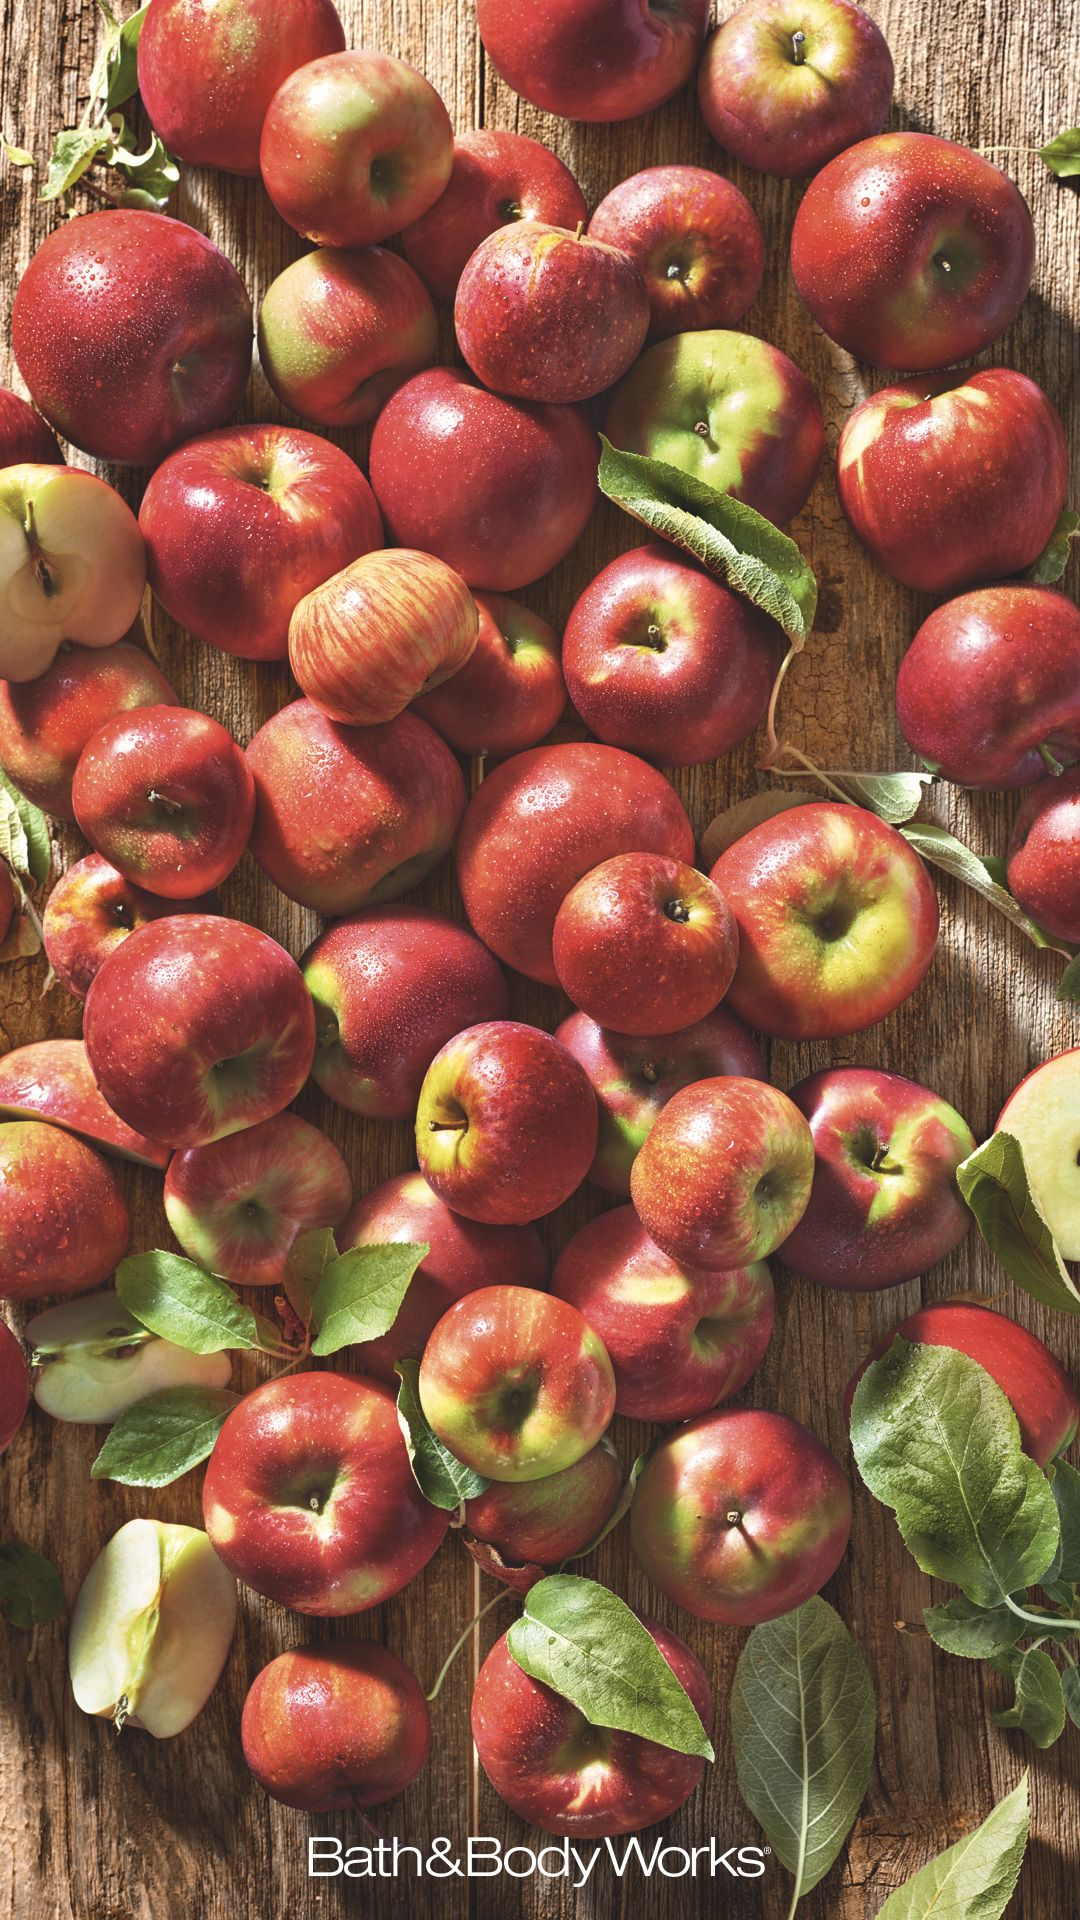 Apple iPhone Wallpaper Apple wallpaper iphone, Fruit